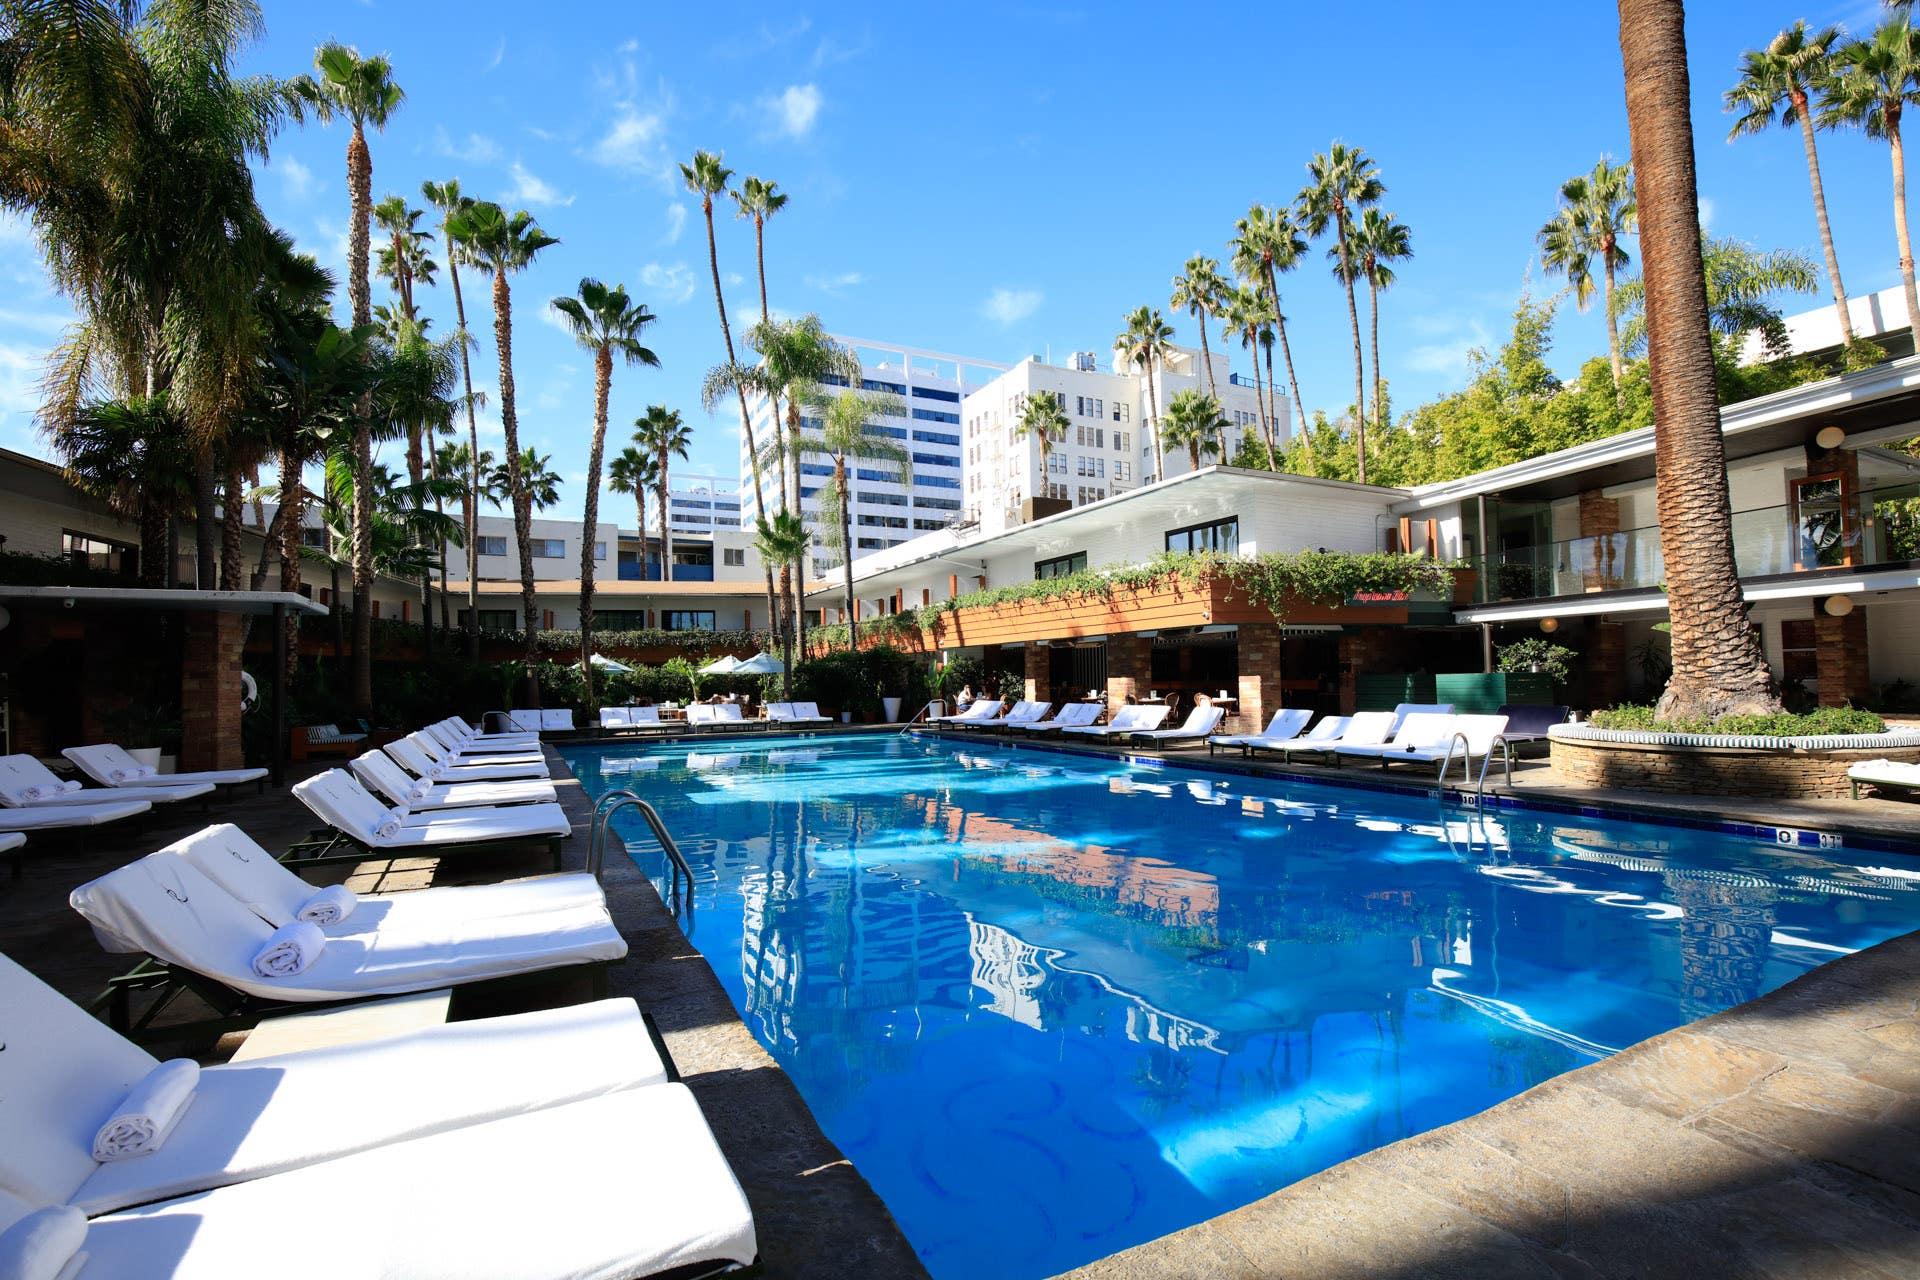 Hollywood Roosevelt Tropicana Pool and Cabanas